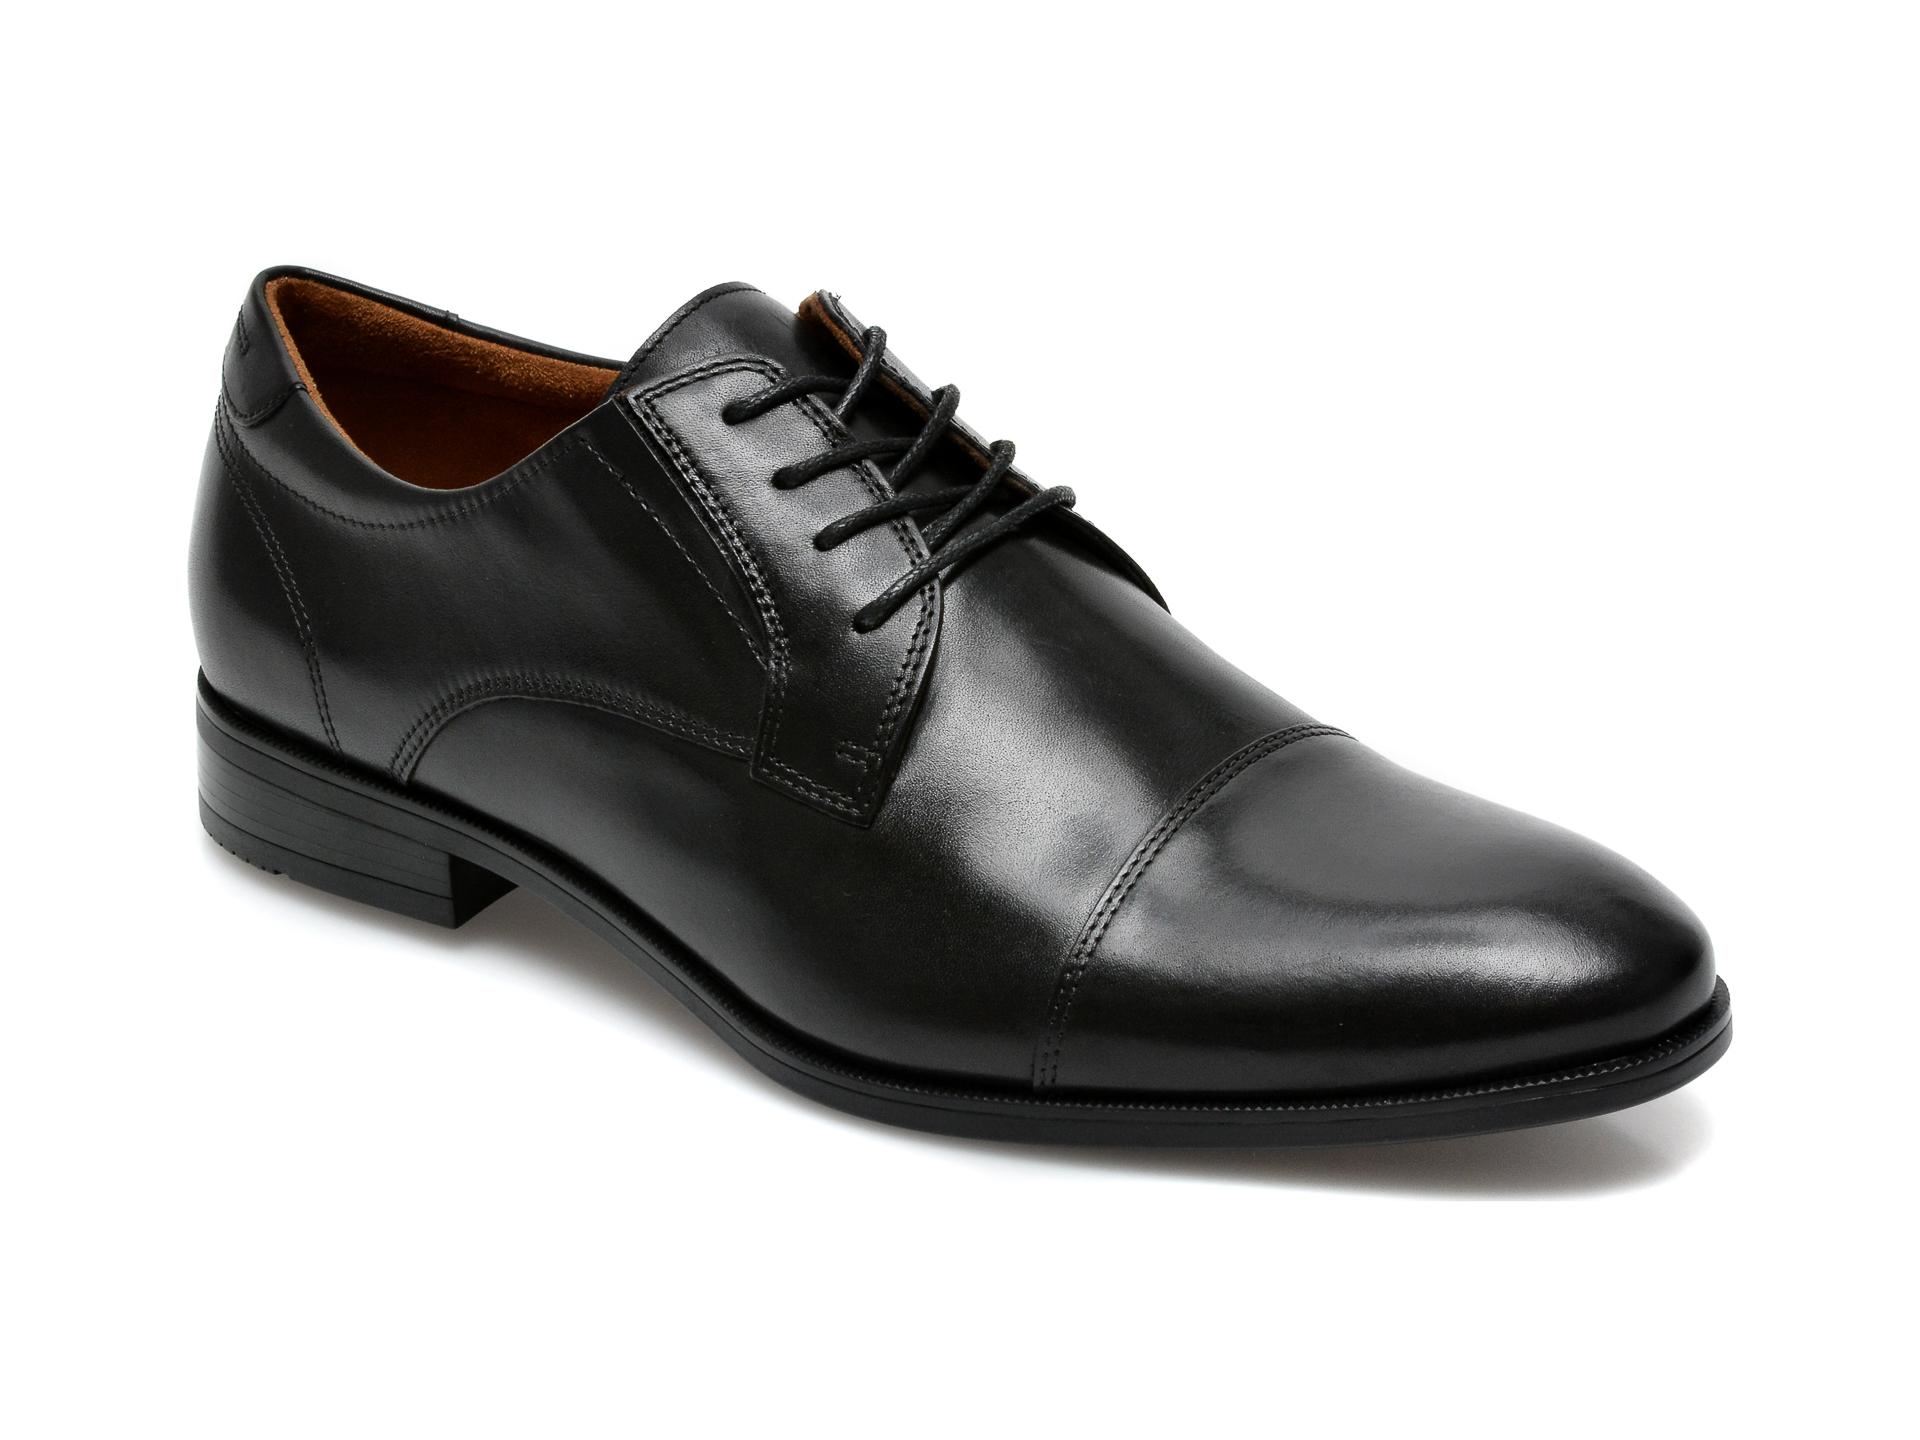 Pantofi ALDO negri, Cortleyflex001, din piele naturala imagine otter.ro 2021